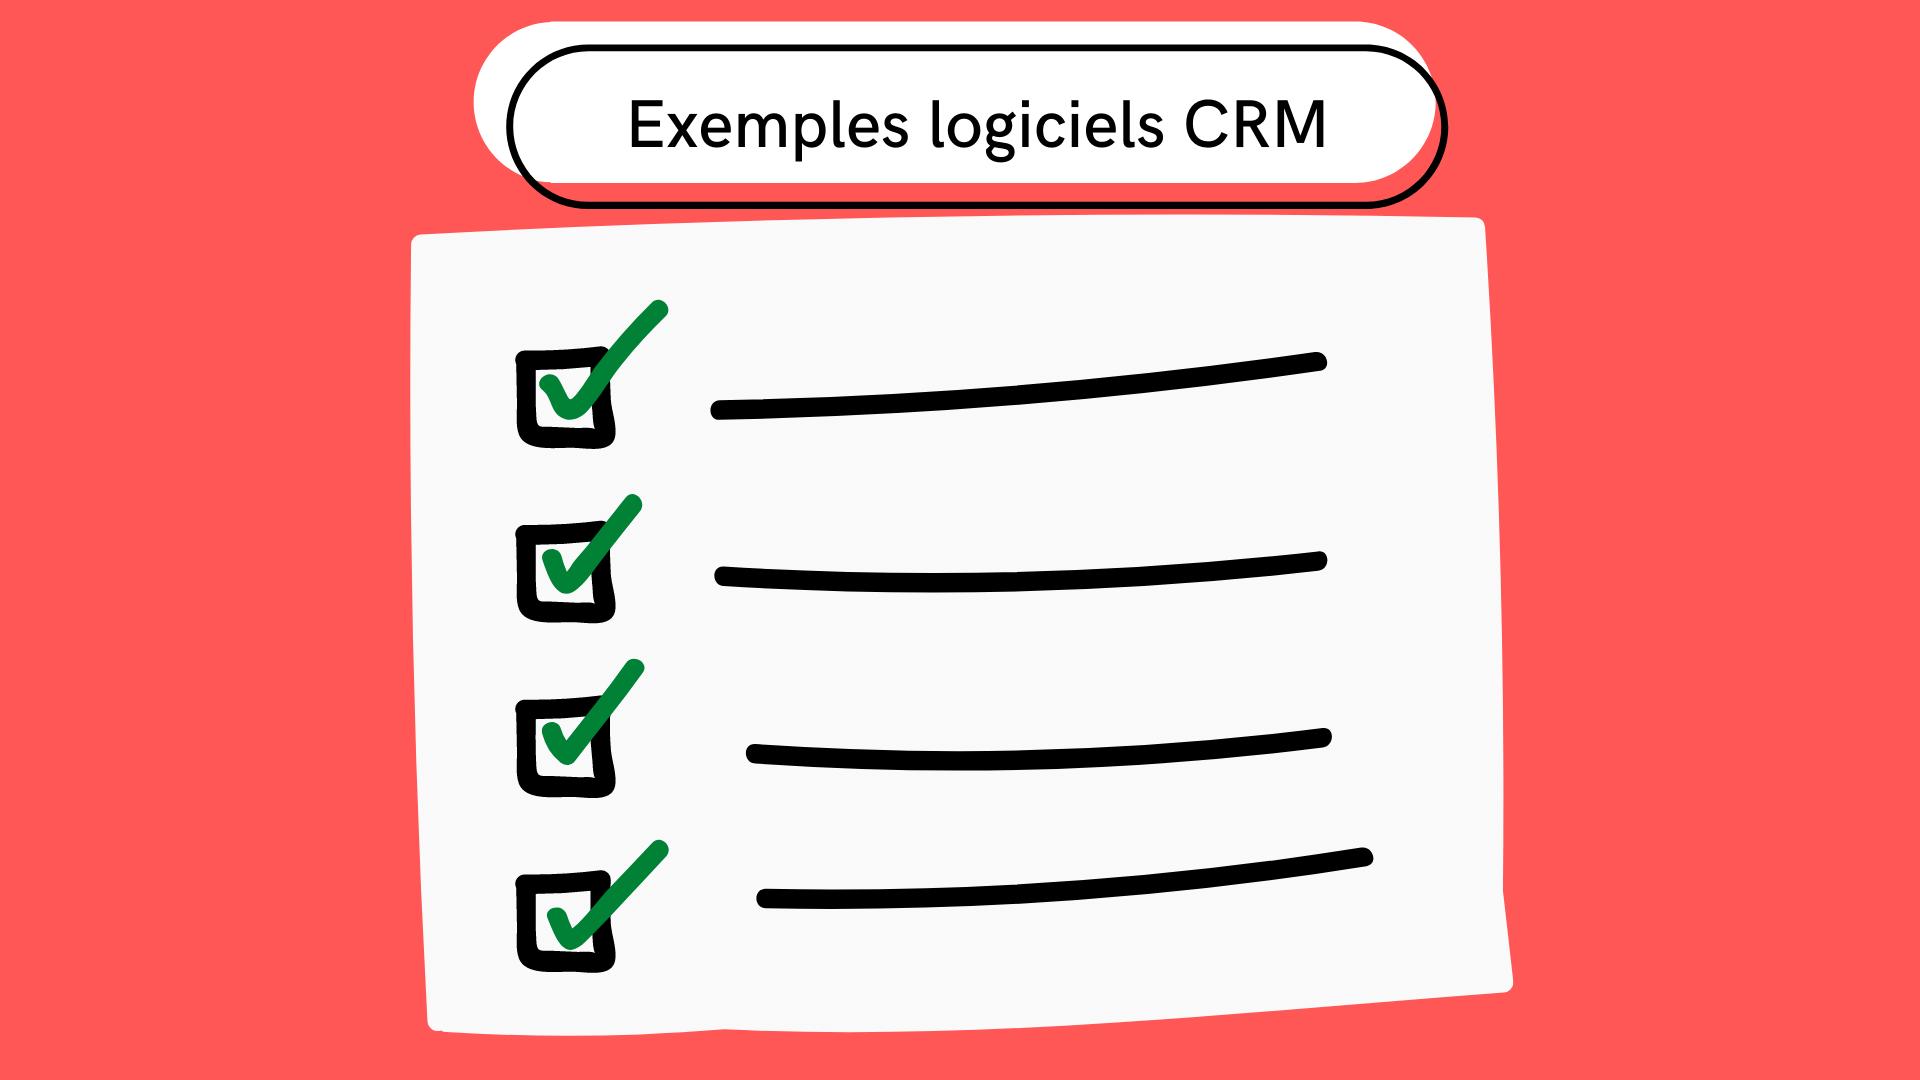 5 exemples de logiciel CRM